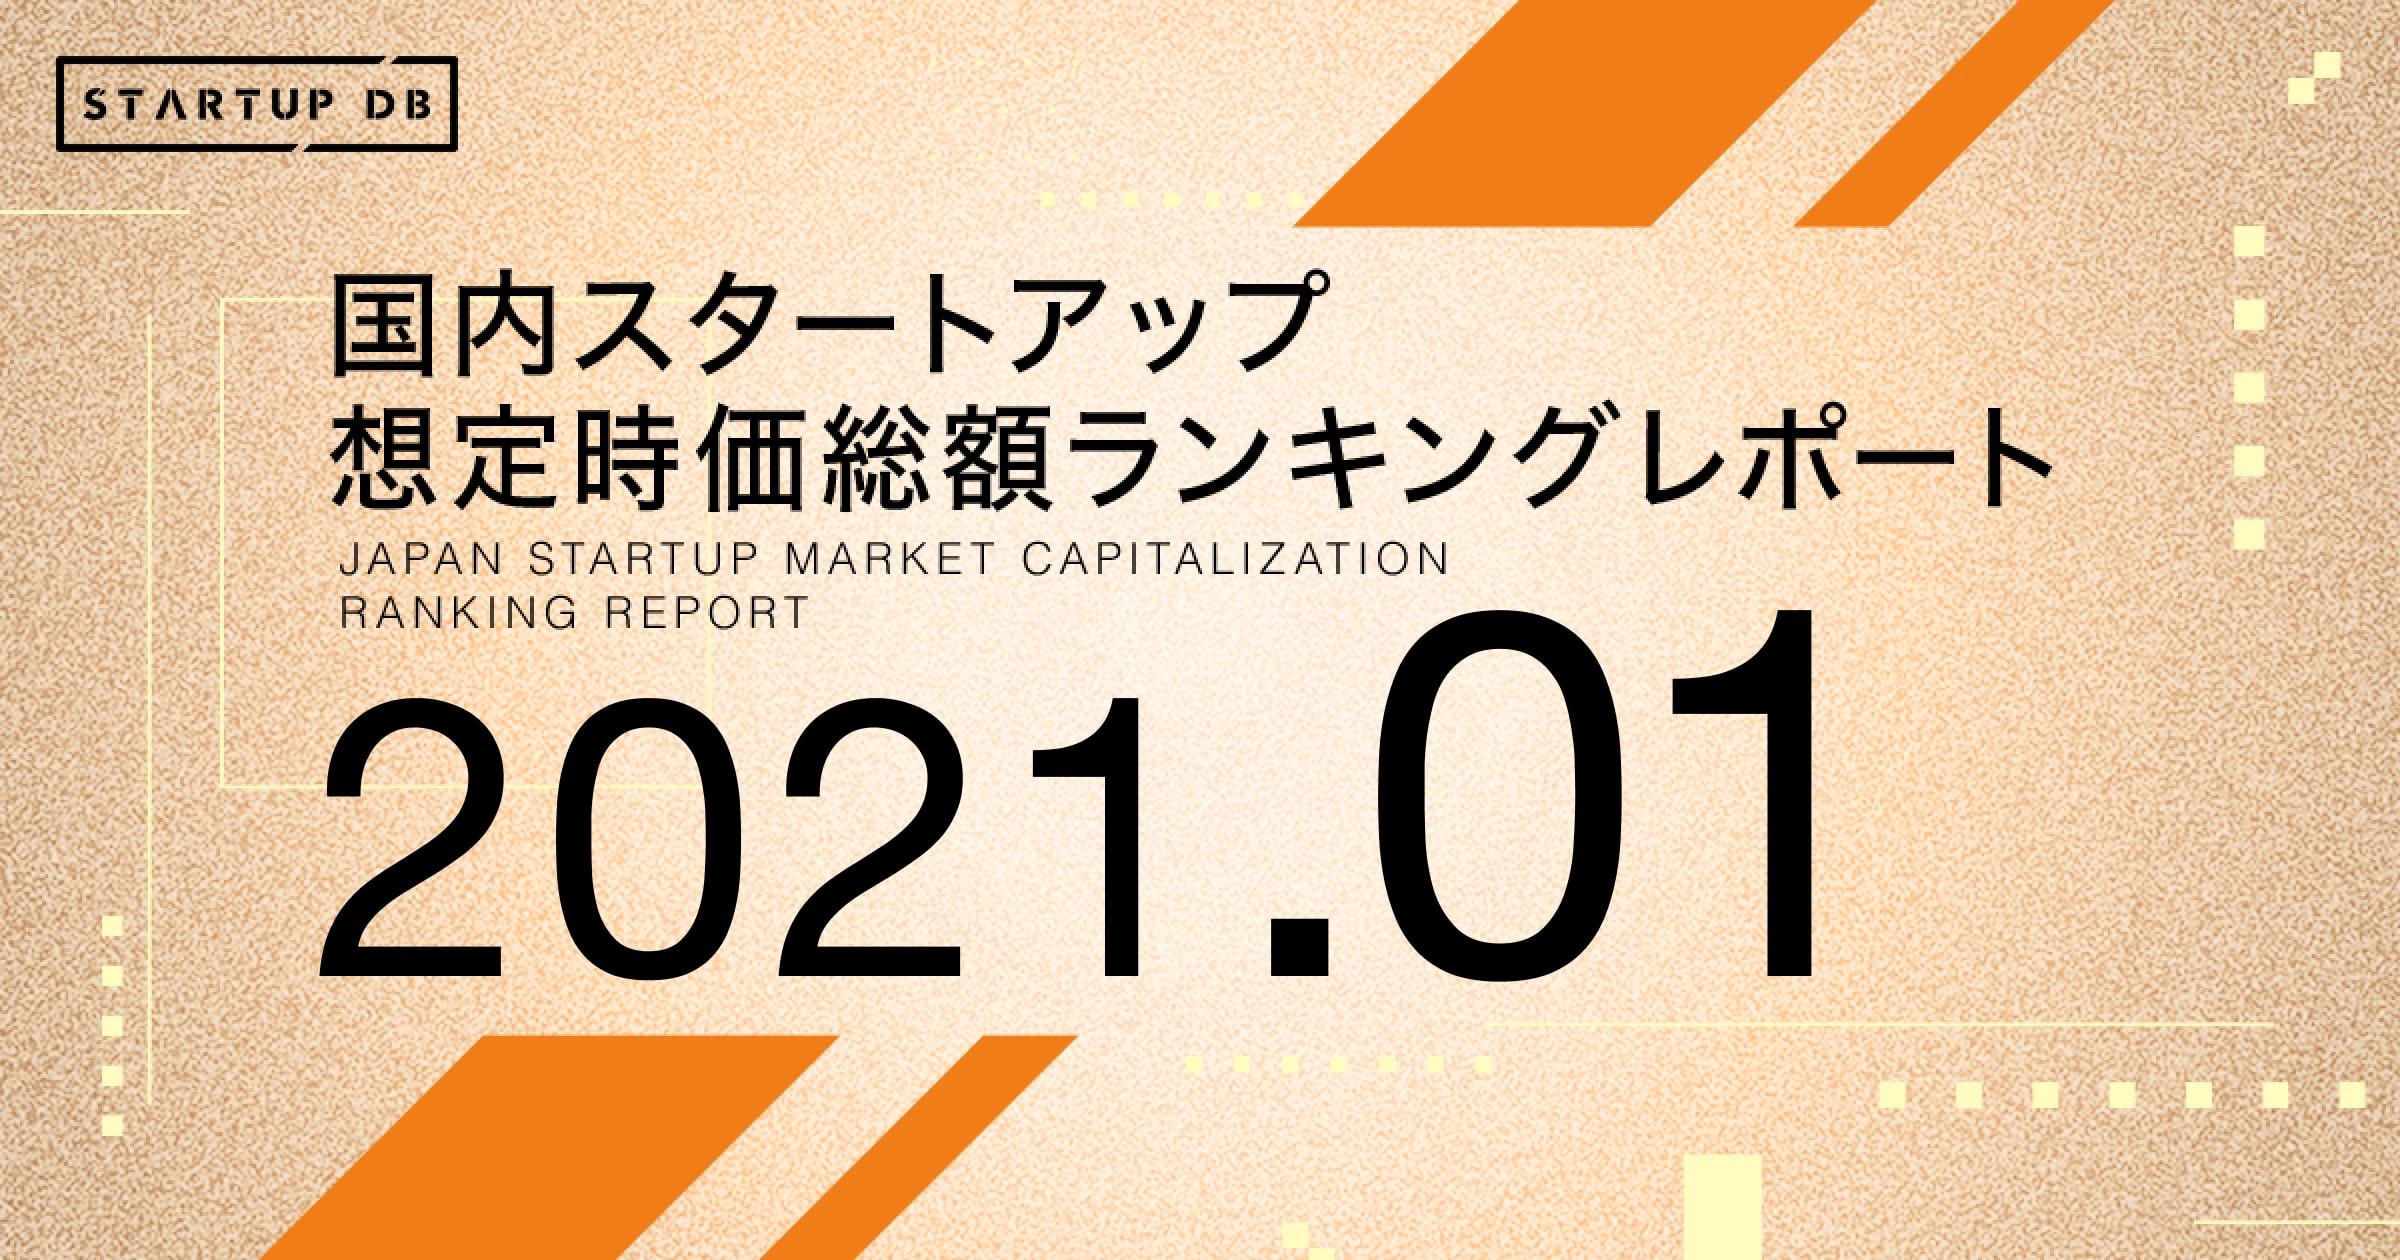 【STARTUP DB】調査結果 国内スタートアップ想定時価総額ランキング(2021年1月)